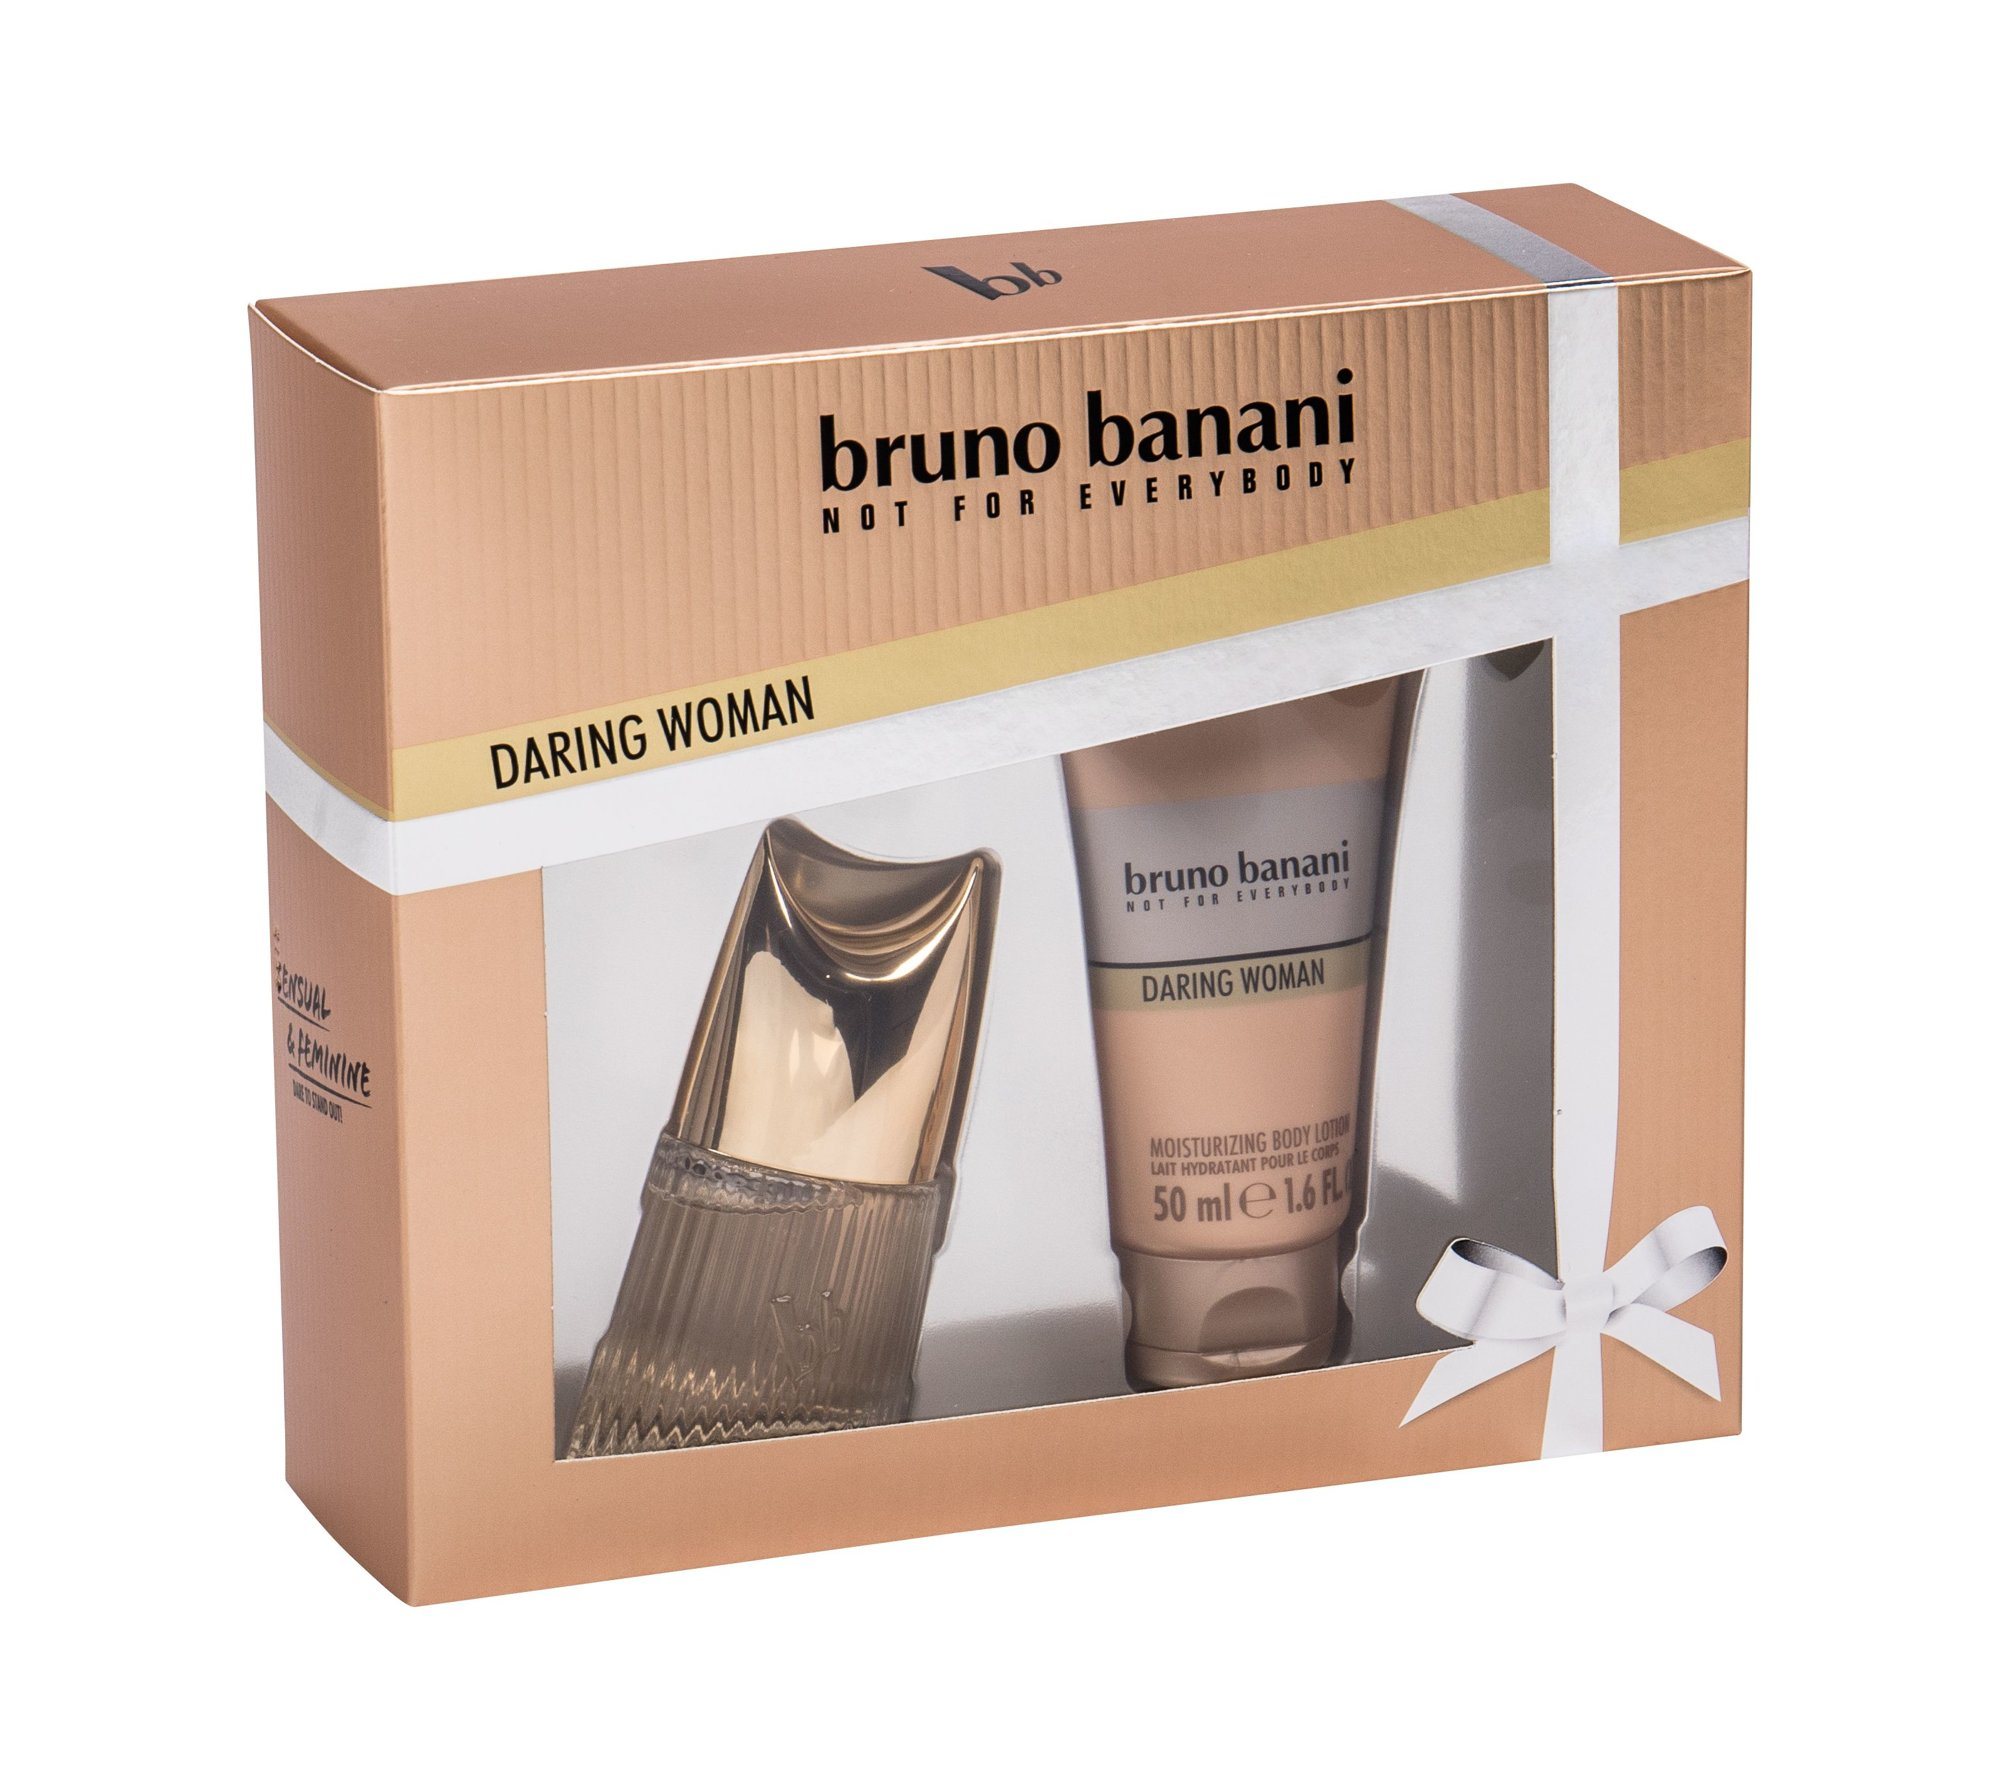 Bruno Banani Daring Woman Eau de Toilette 20ml